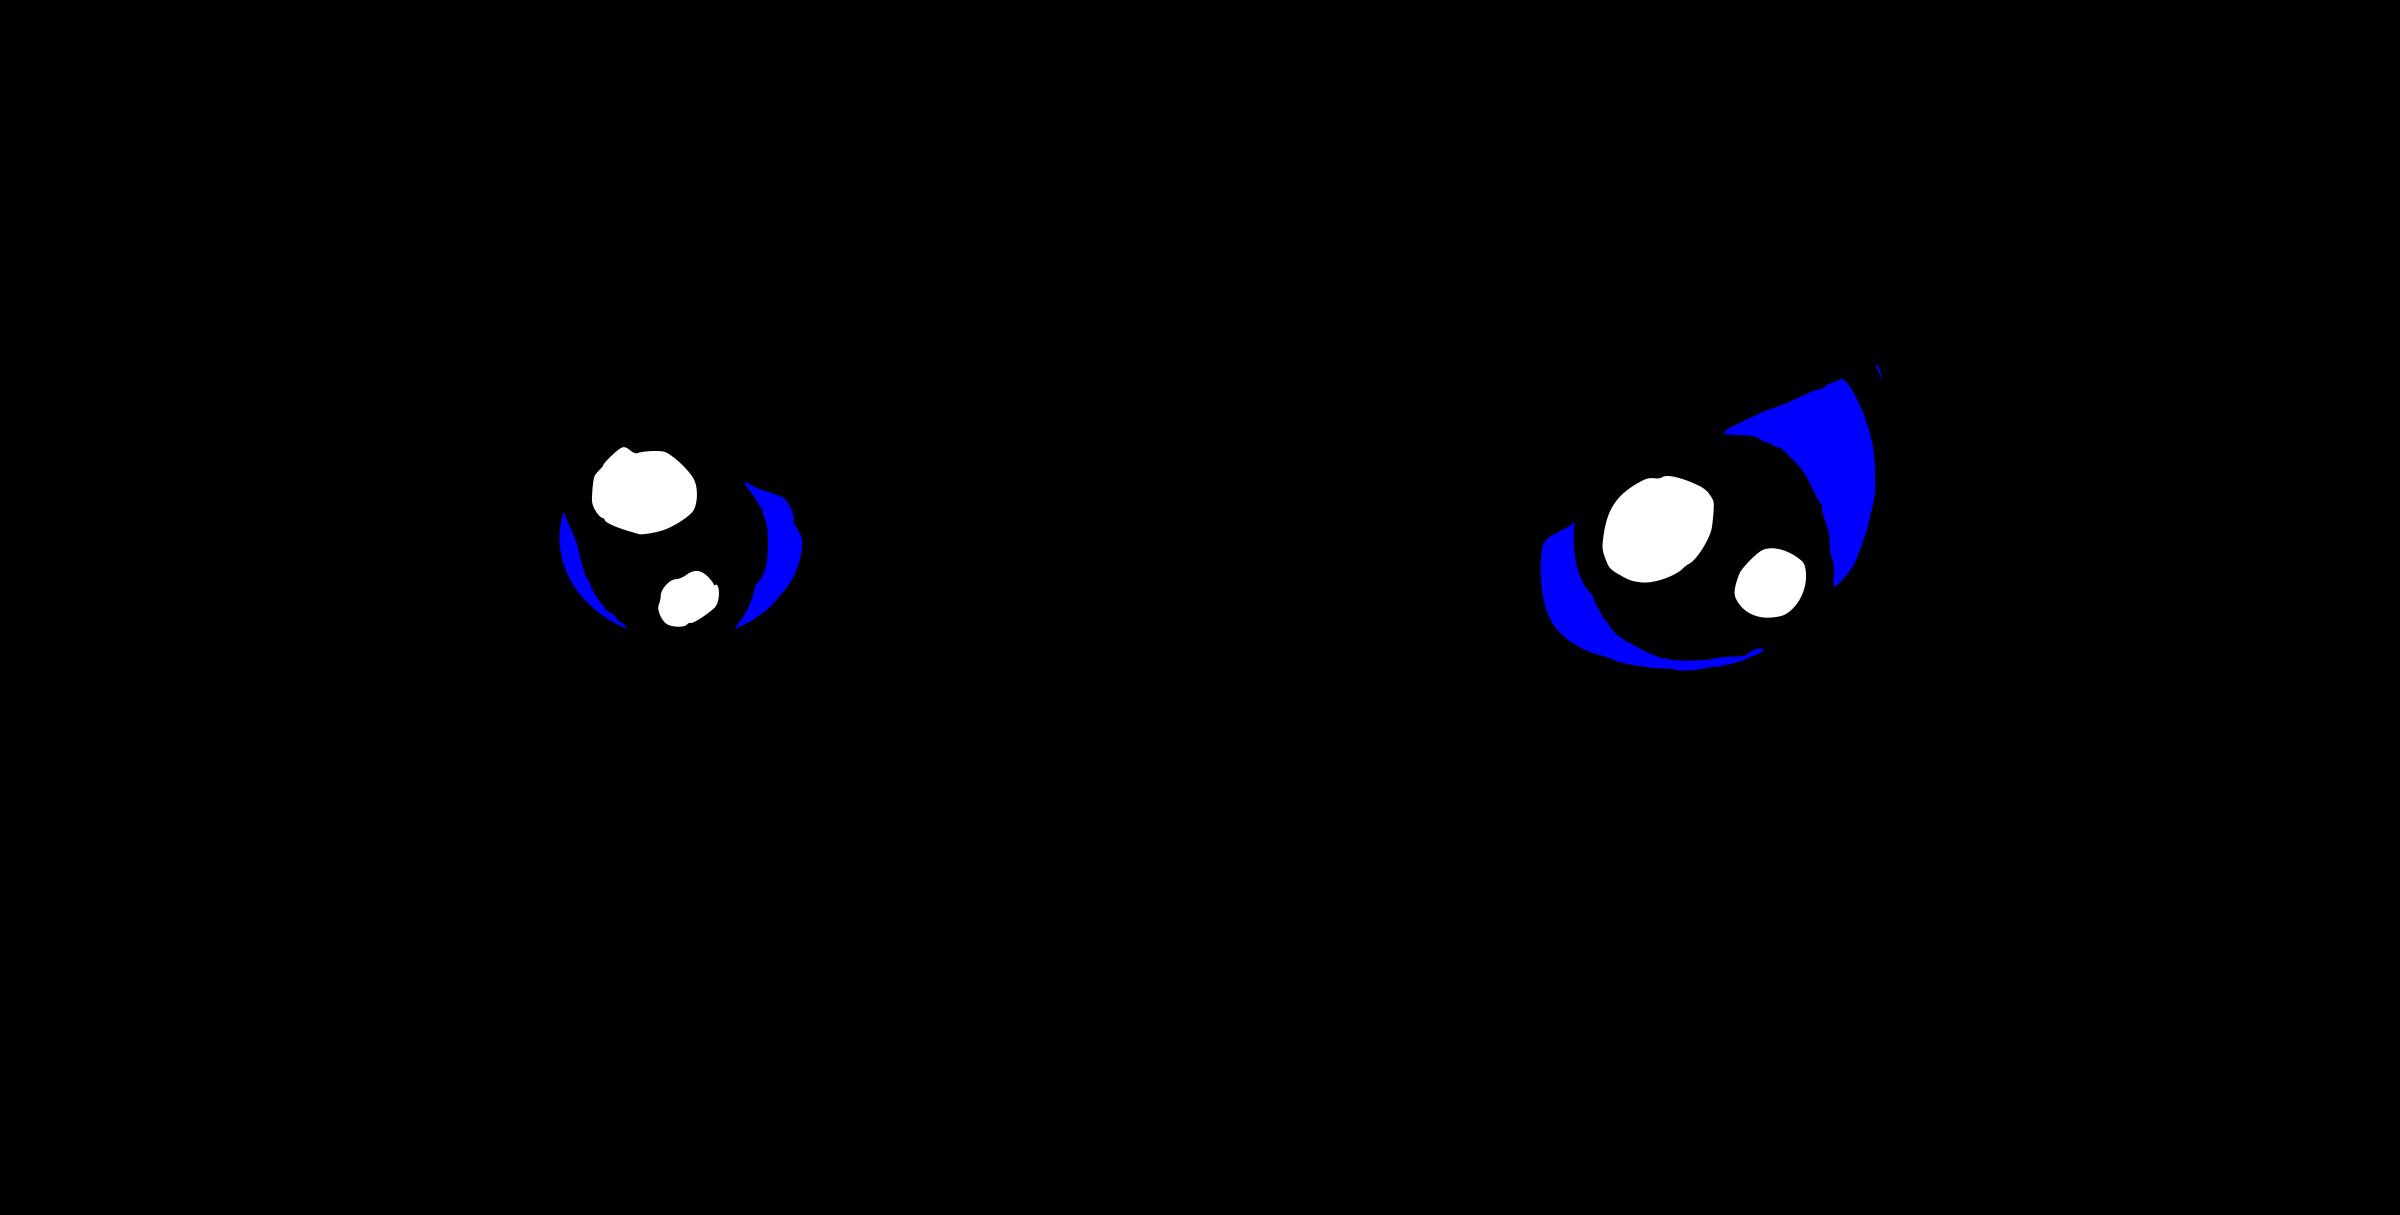 Clipart eye line art. Angry blue eyes big